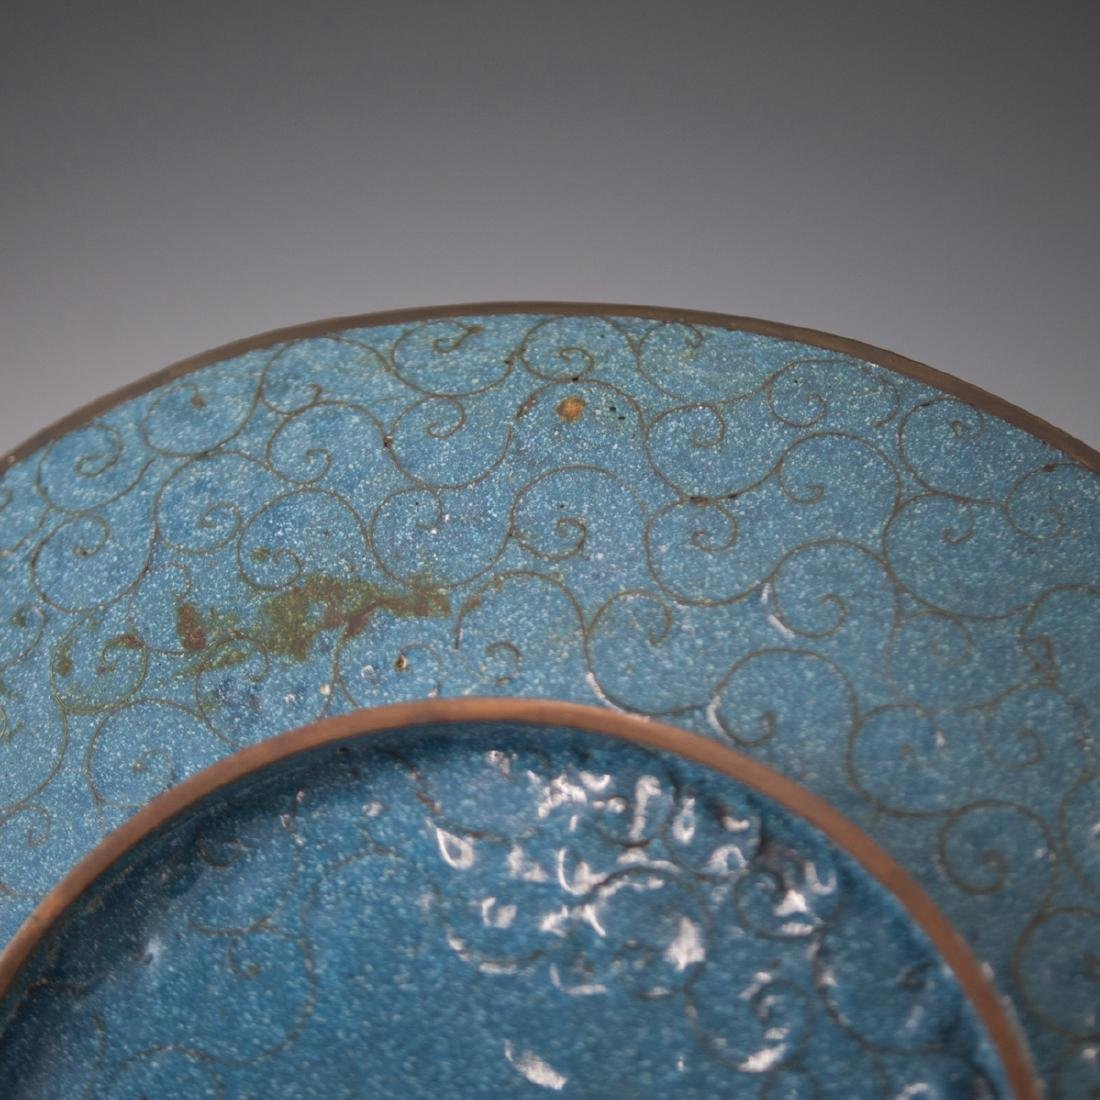 Antique Japanese Cloisonne Enameled Plate - 4